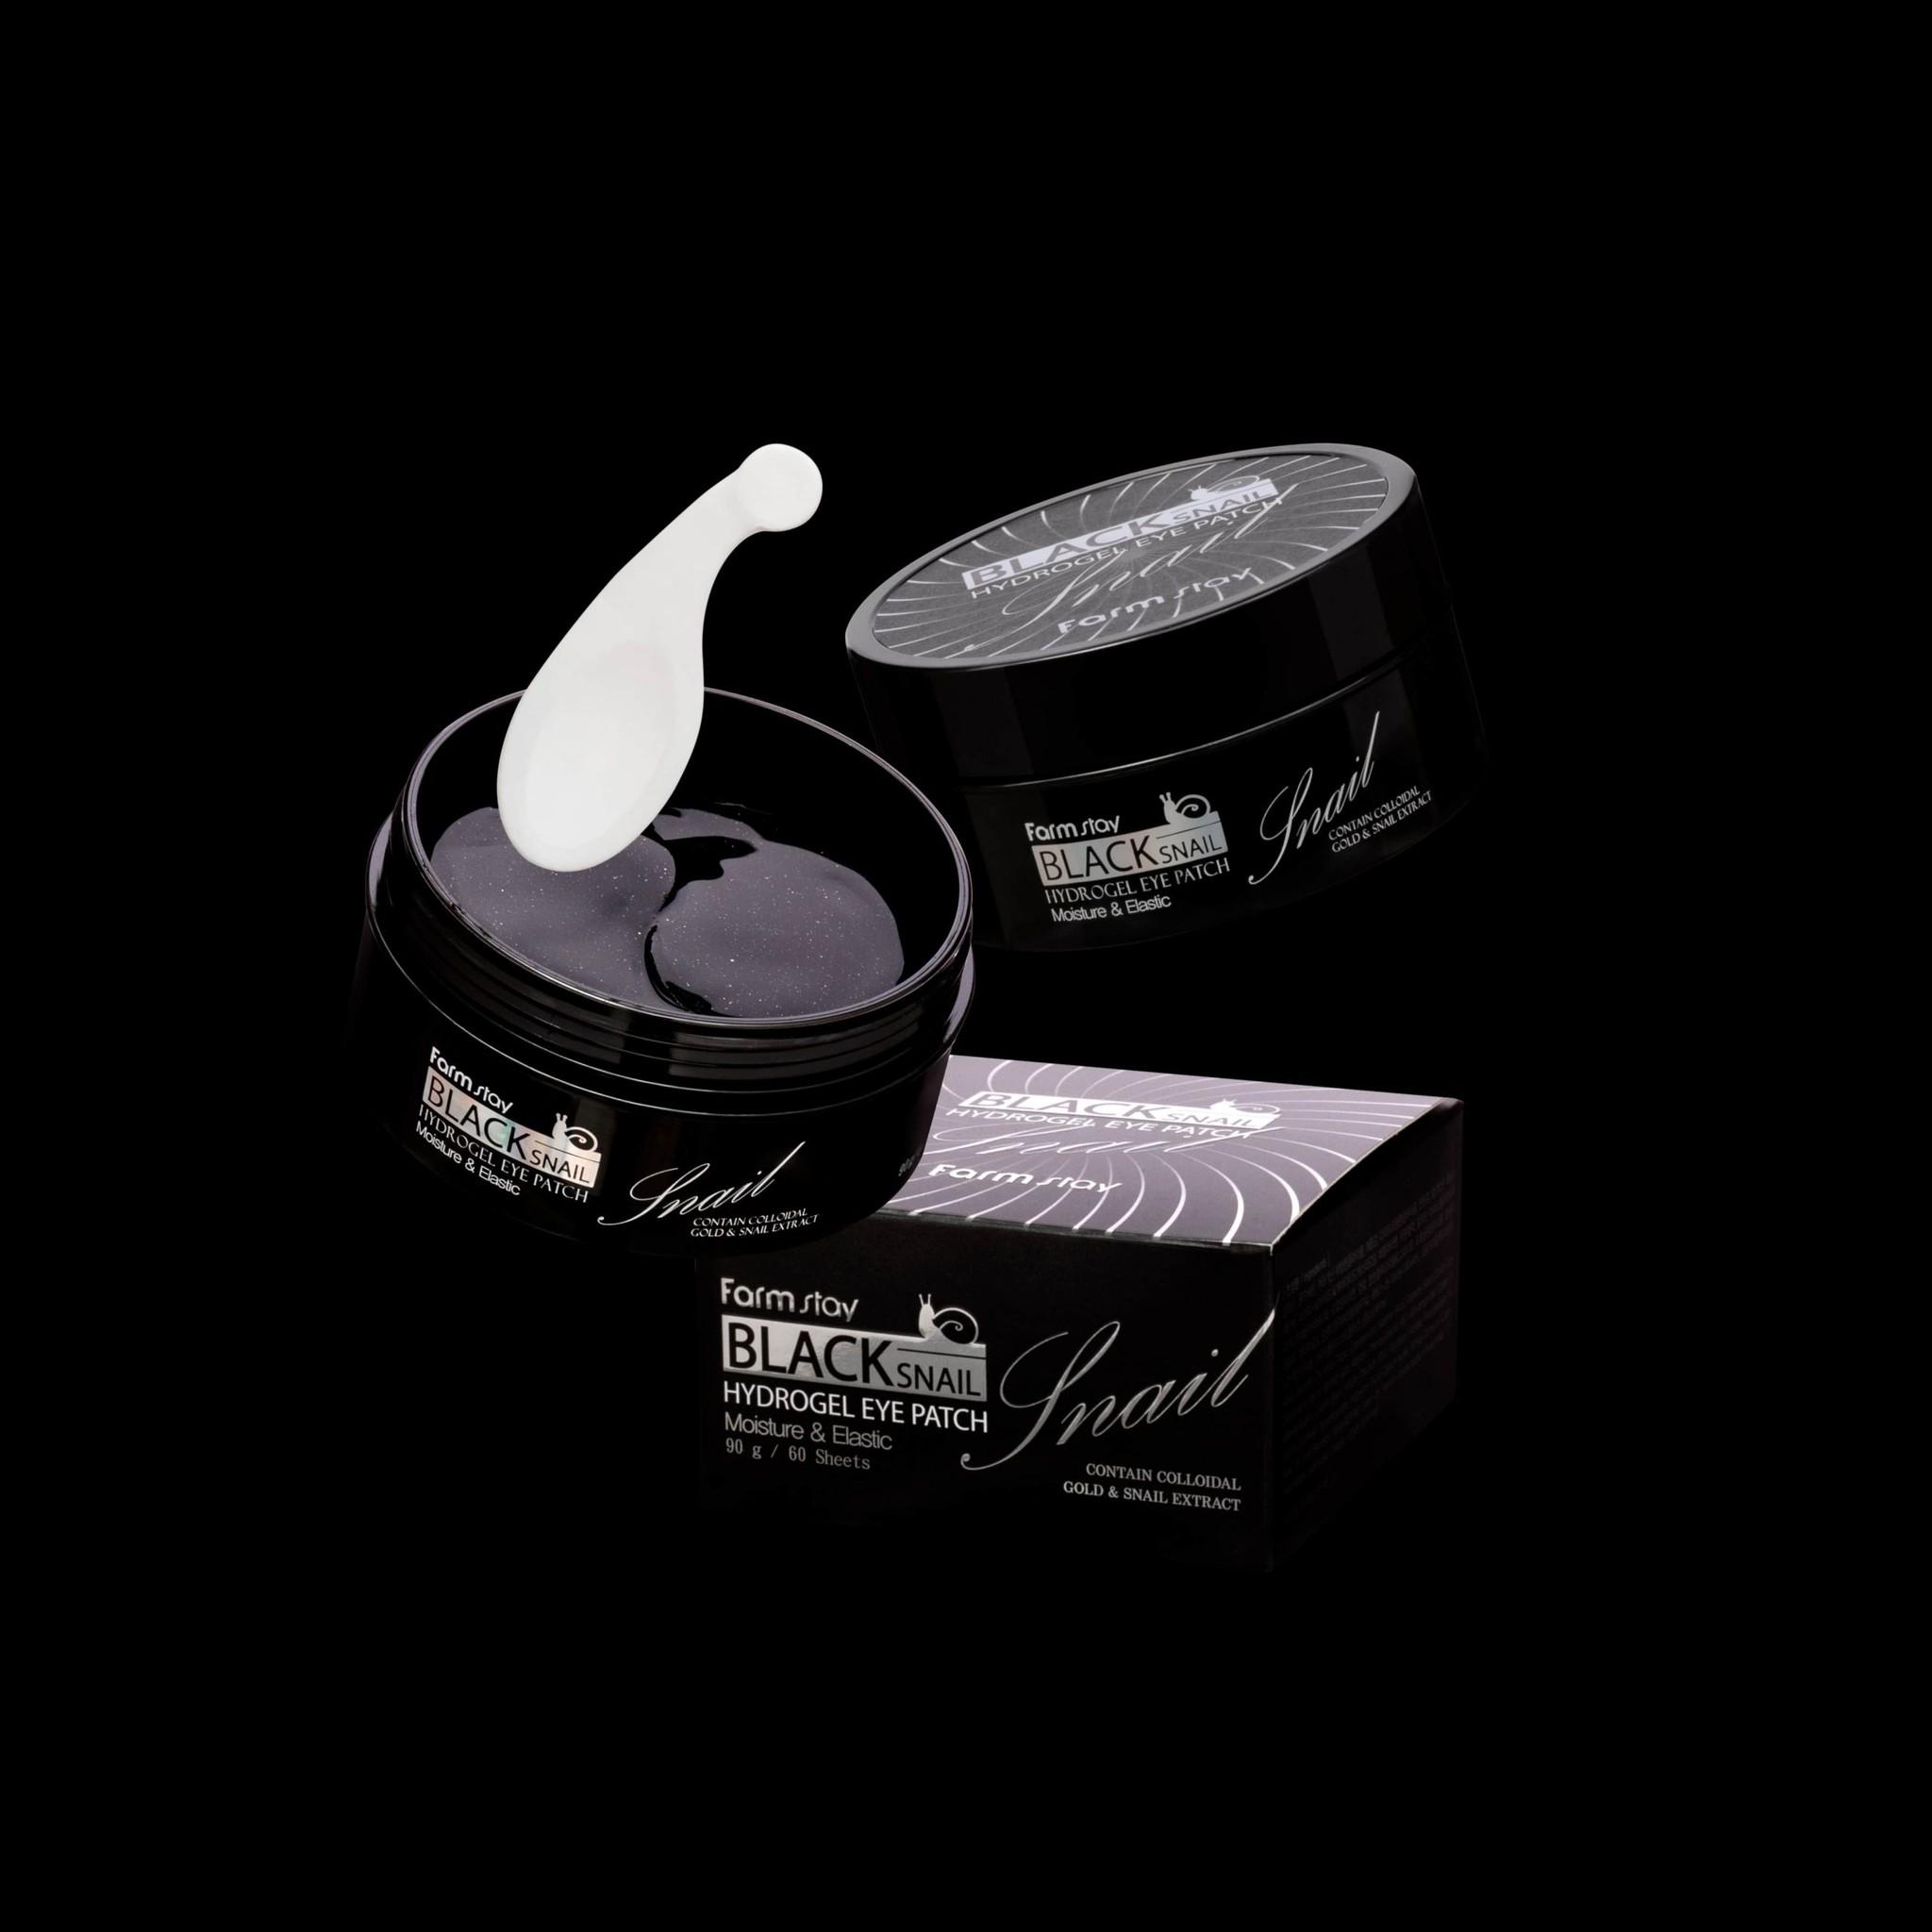 Black Snail Hydrogel Eye Patch-3